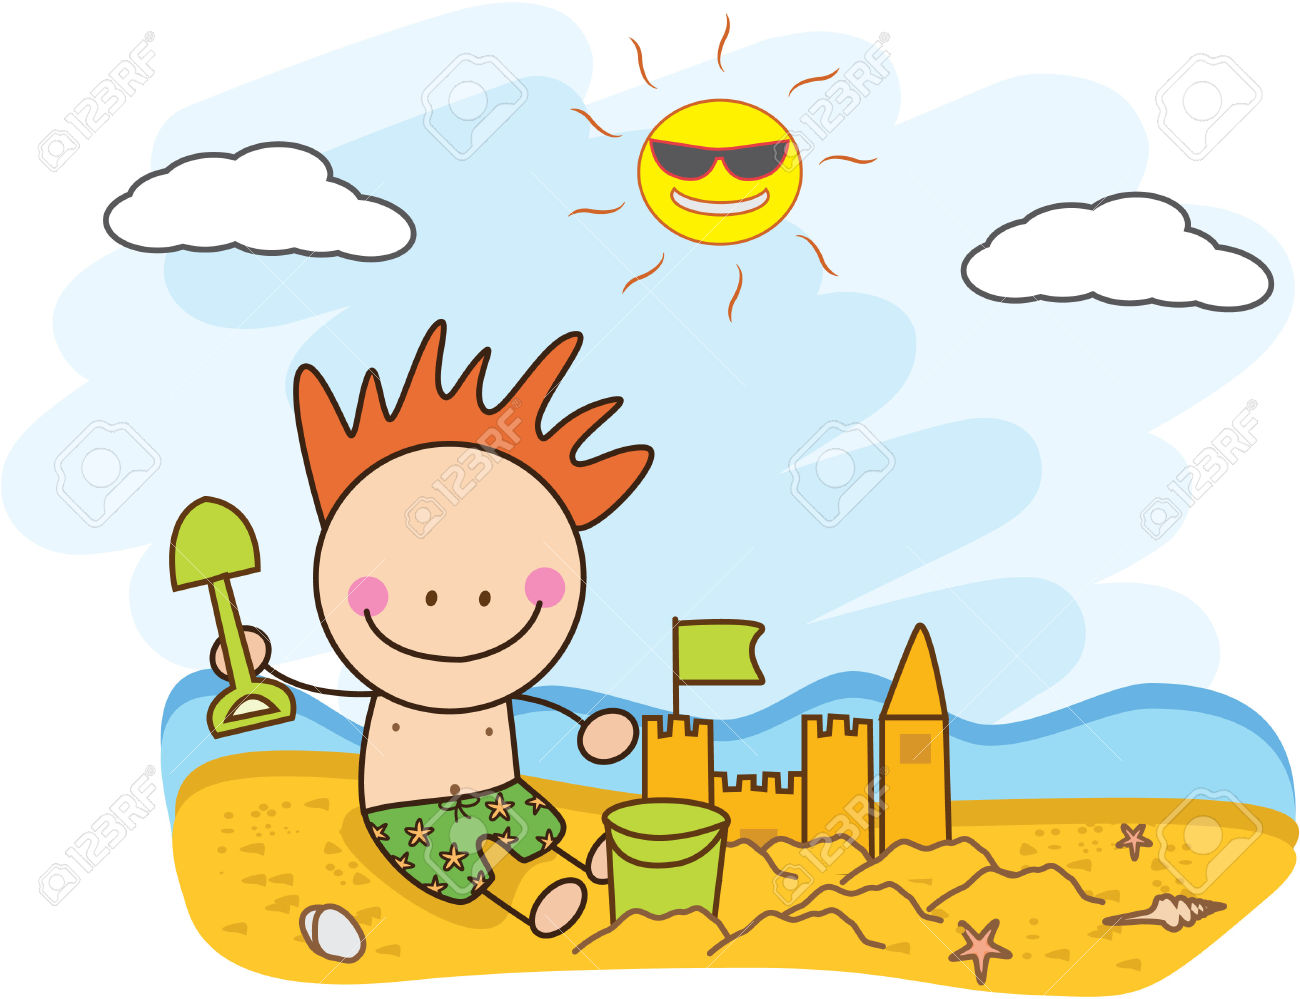 Children Build Sand Castle At Beach Royalty Free Cliparts, Vectors.